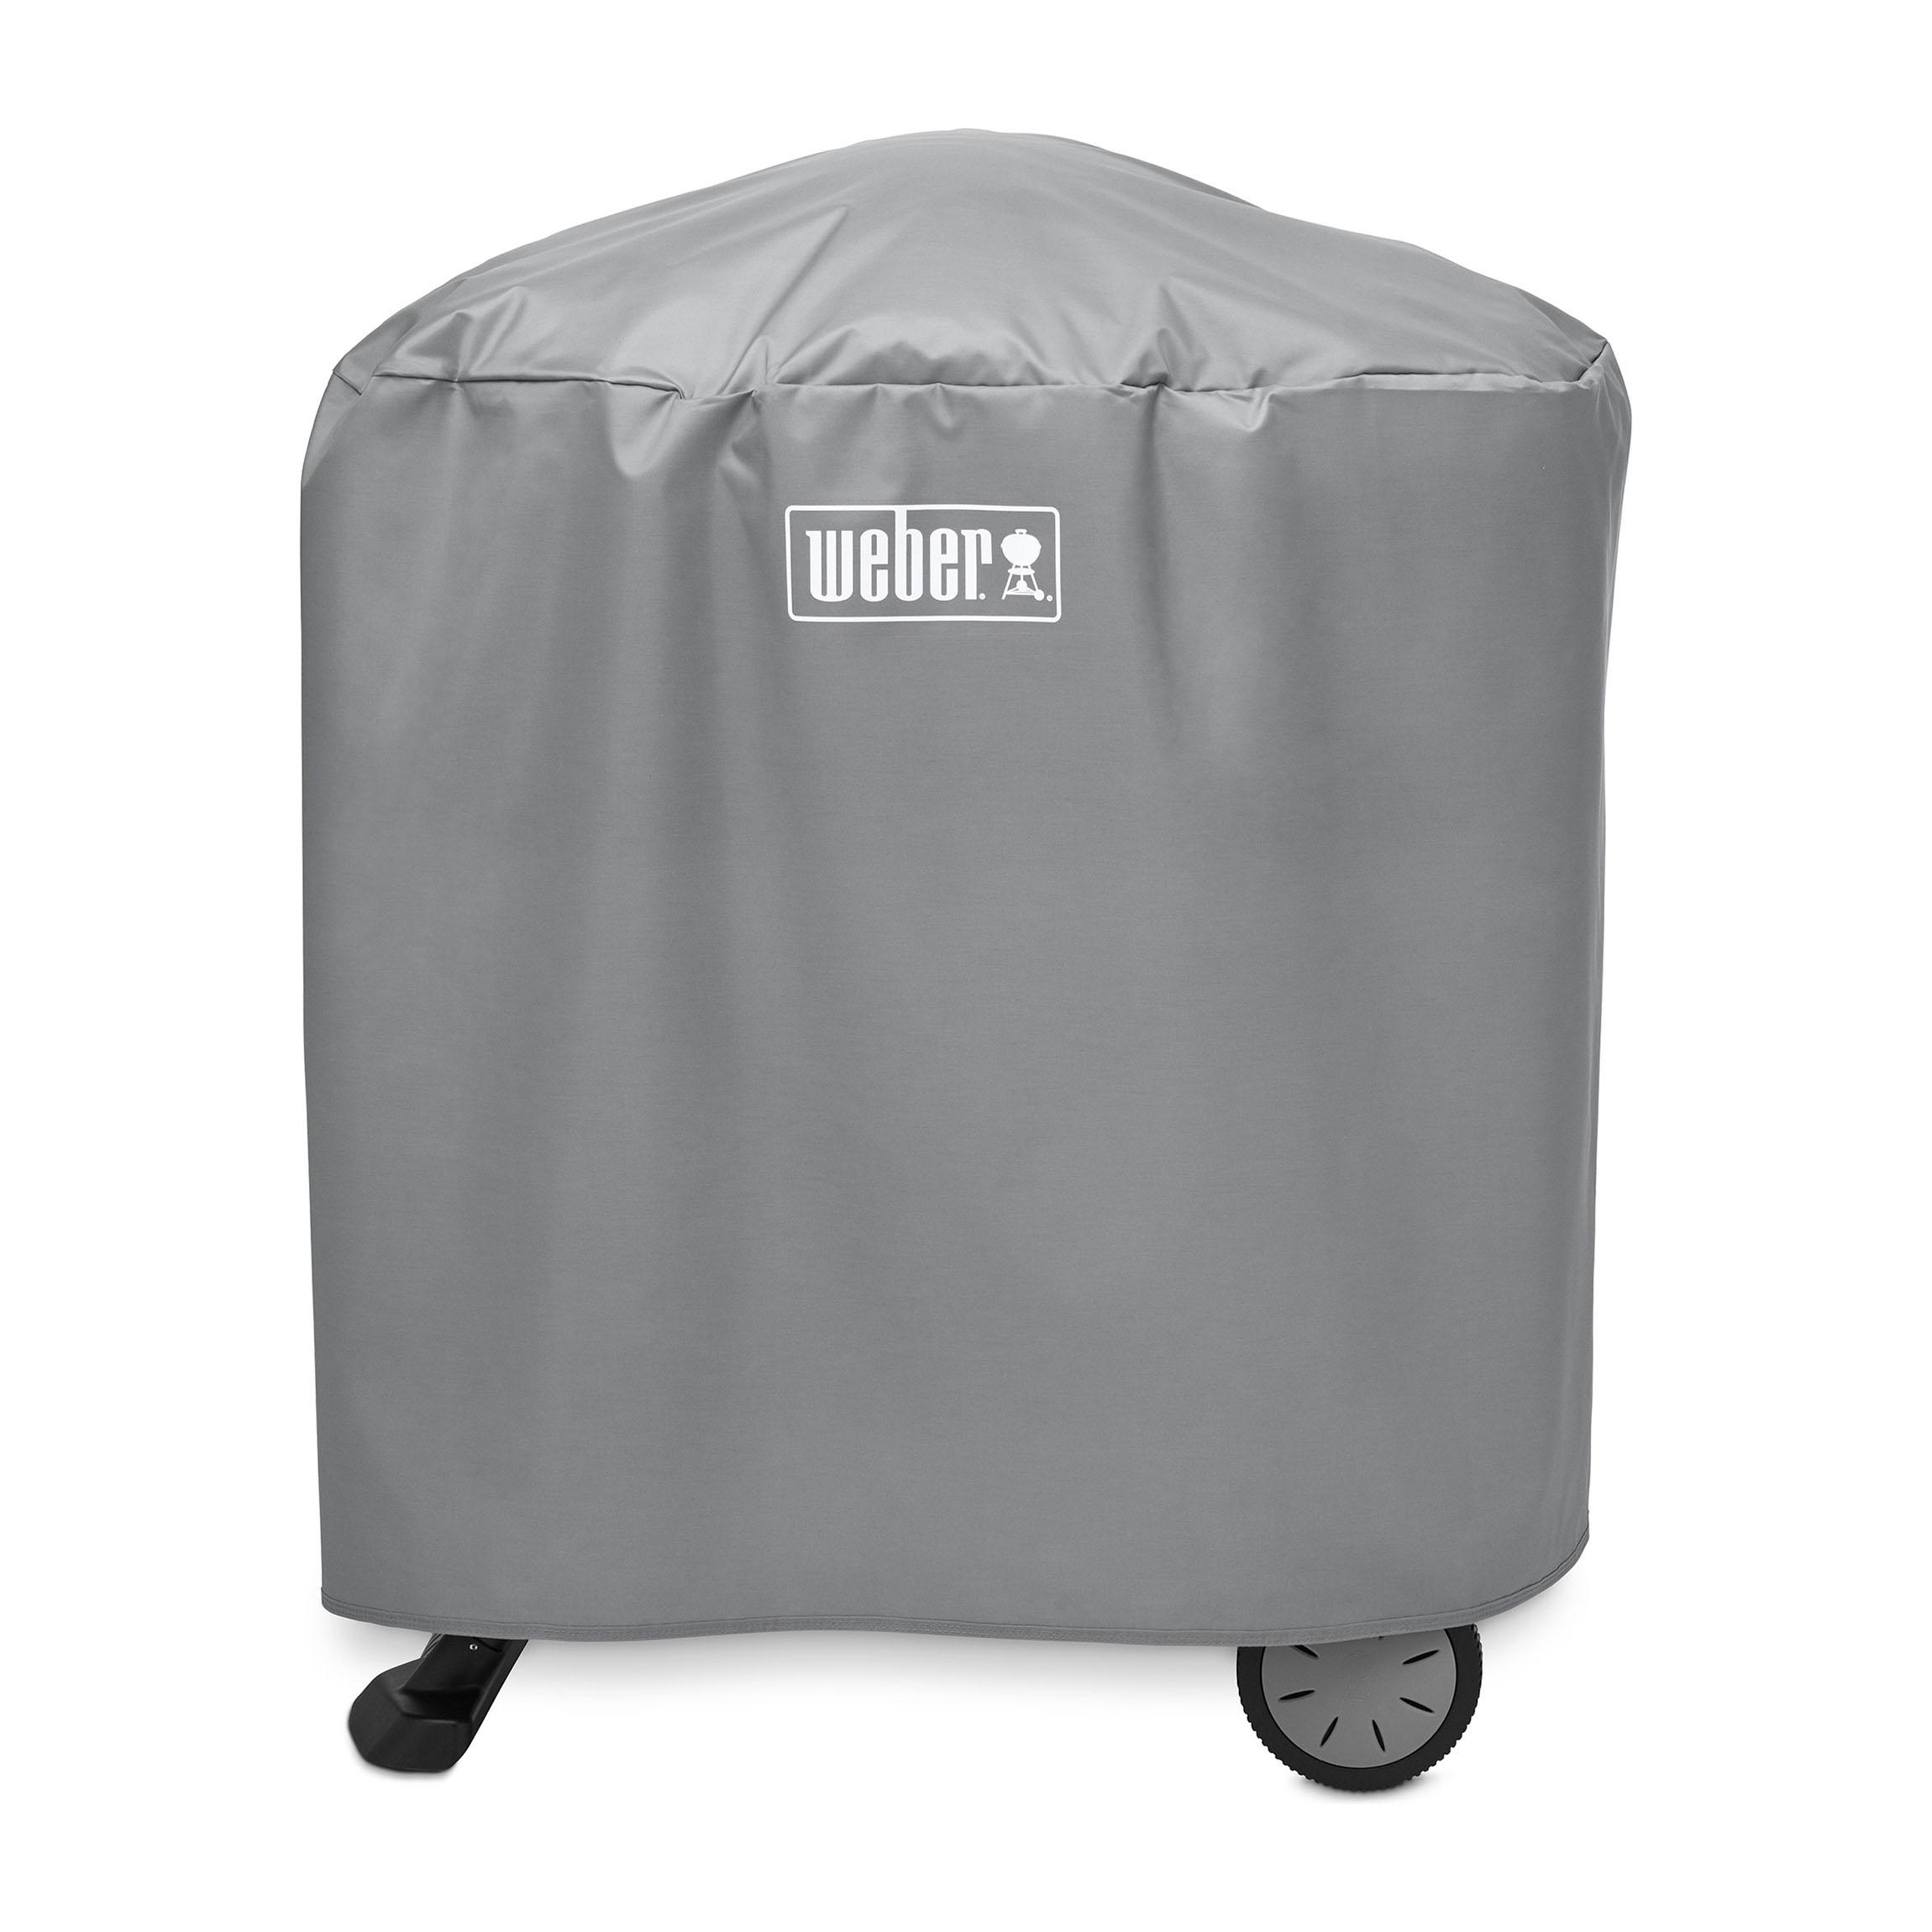 abdeckhaube standard f r weber q serie mit rollwagen oder stand at. Black Bedroom Furniture Sets. Home Design Ideas